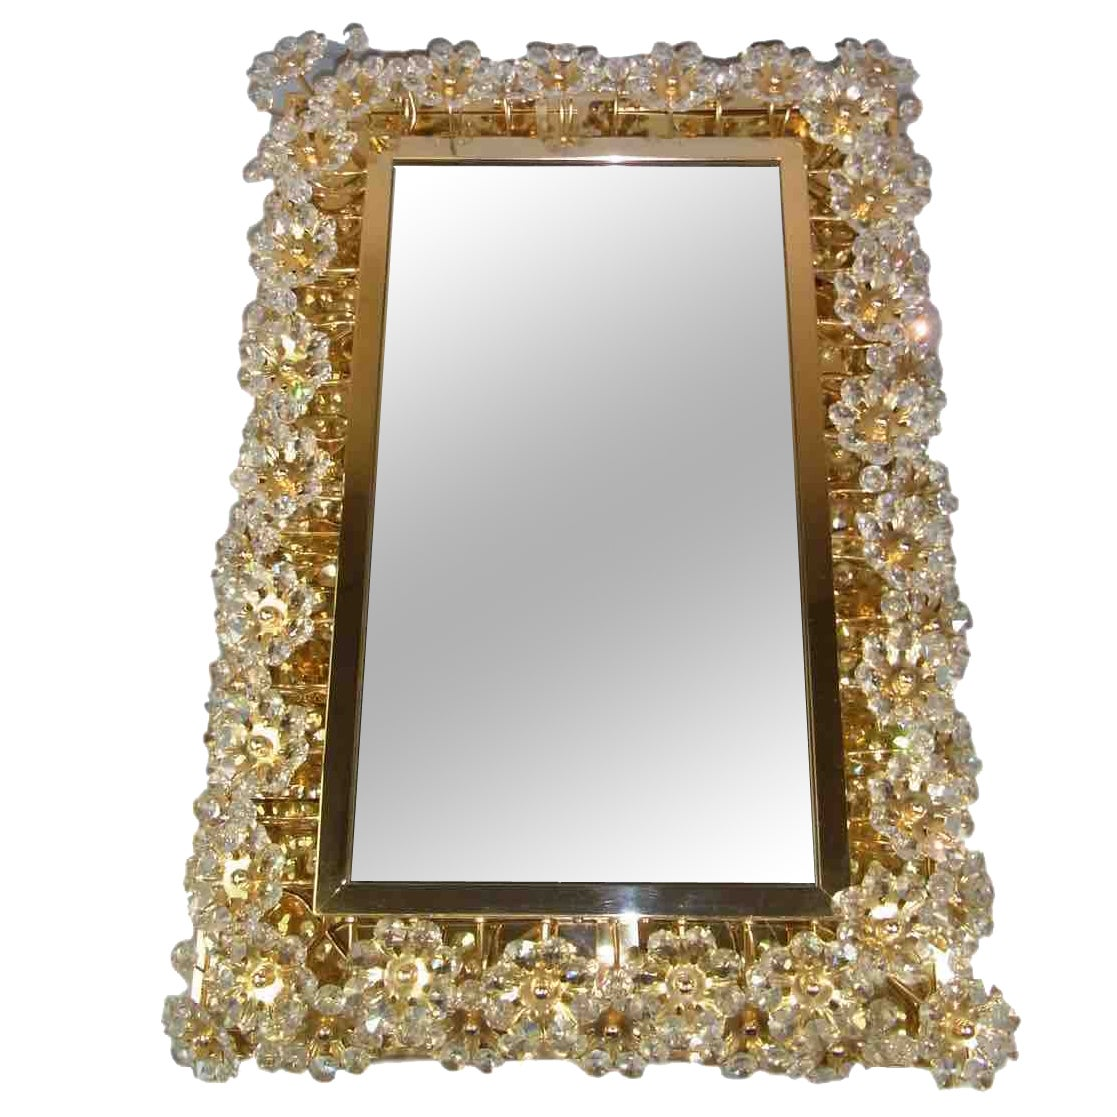 Square Illuminated Palwa Crystal Glass Mirror